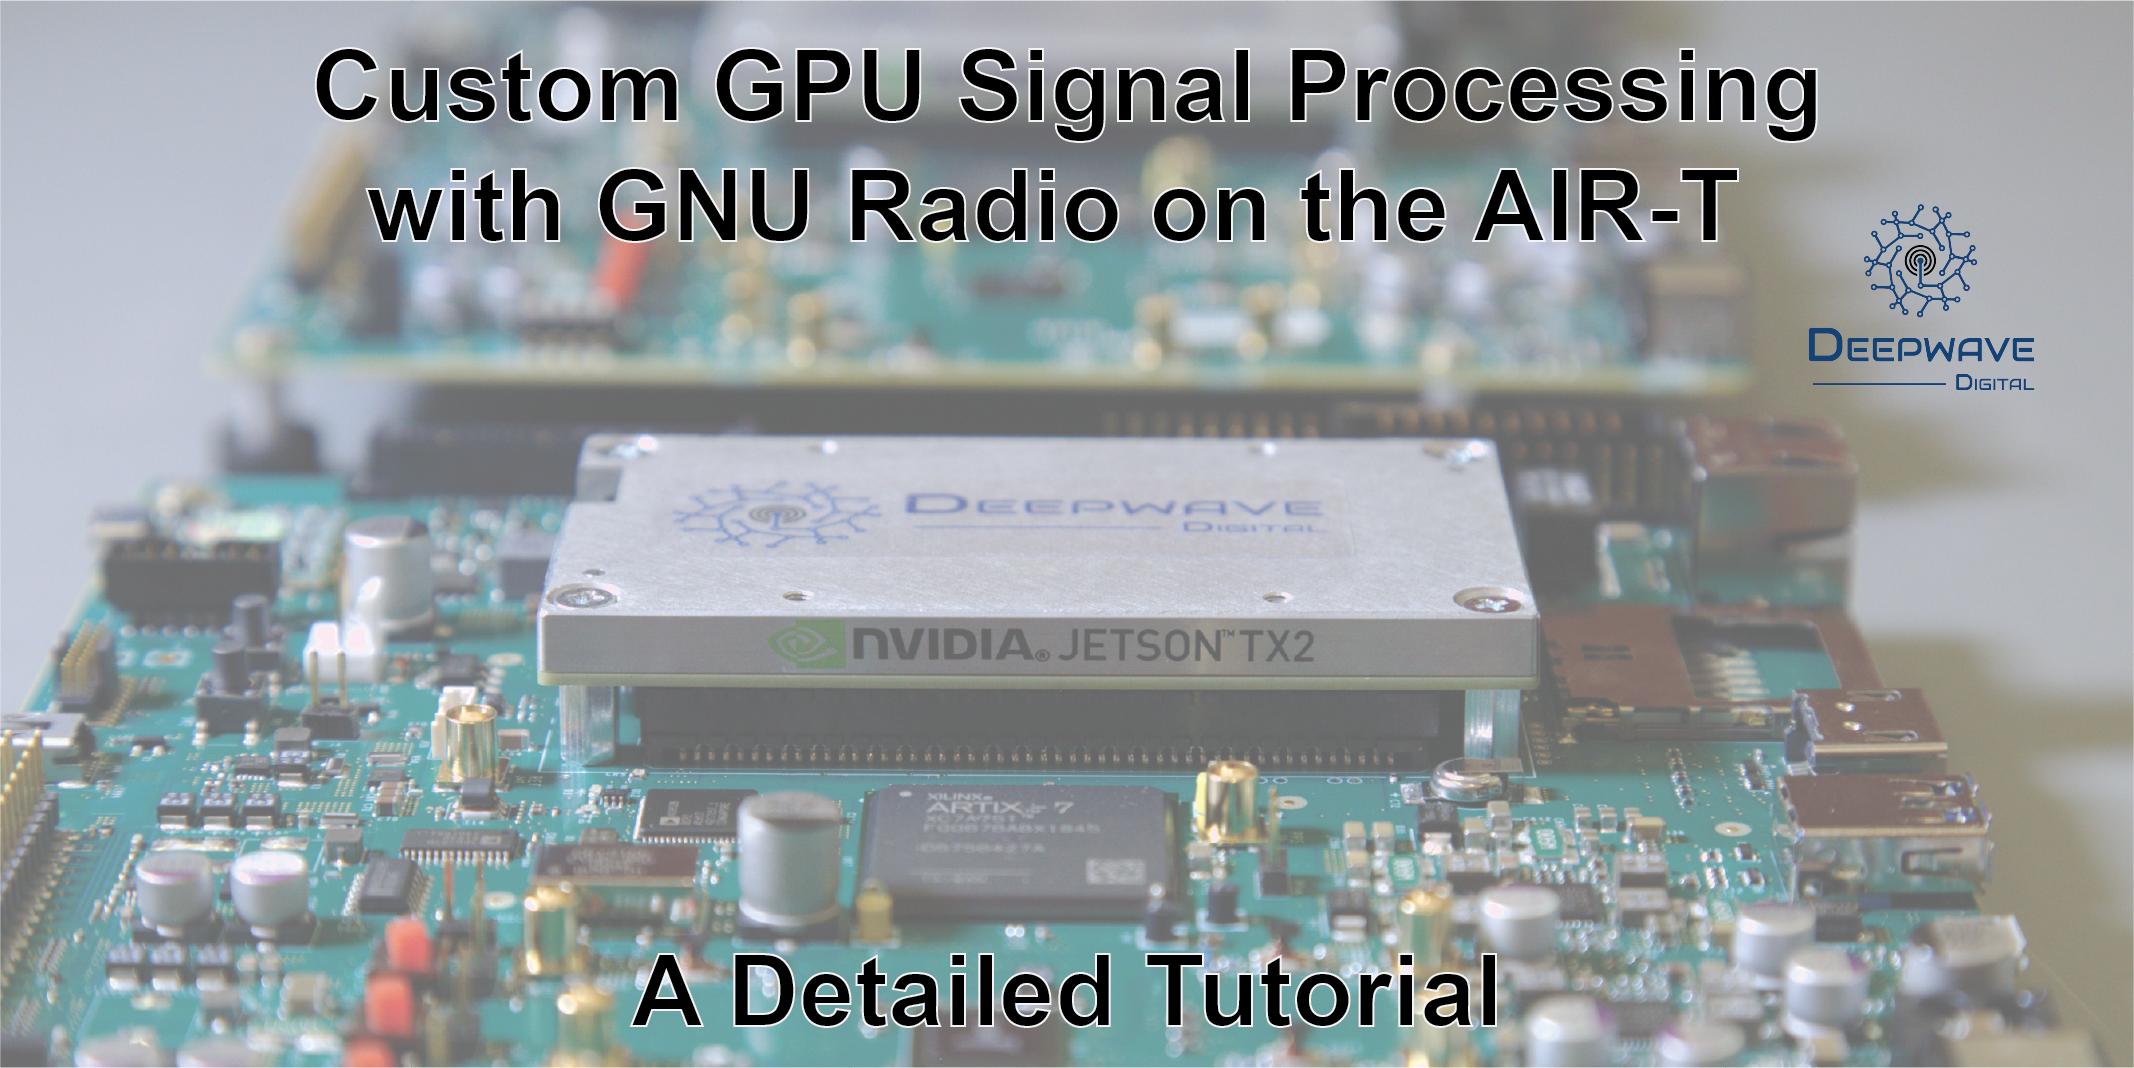 Custom GPU Signal Processing with GNU Radio on the AIR-T